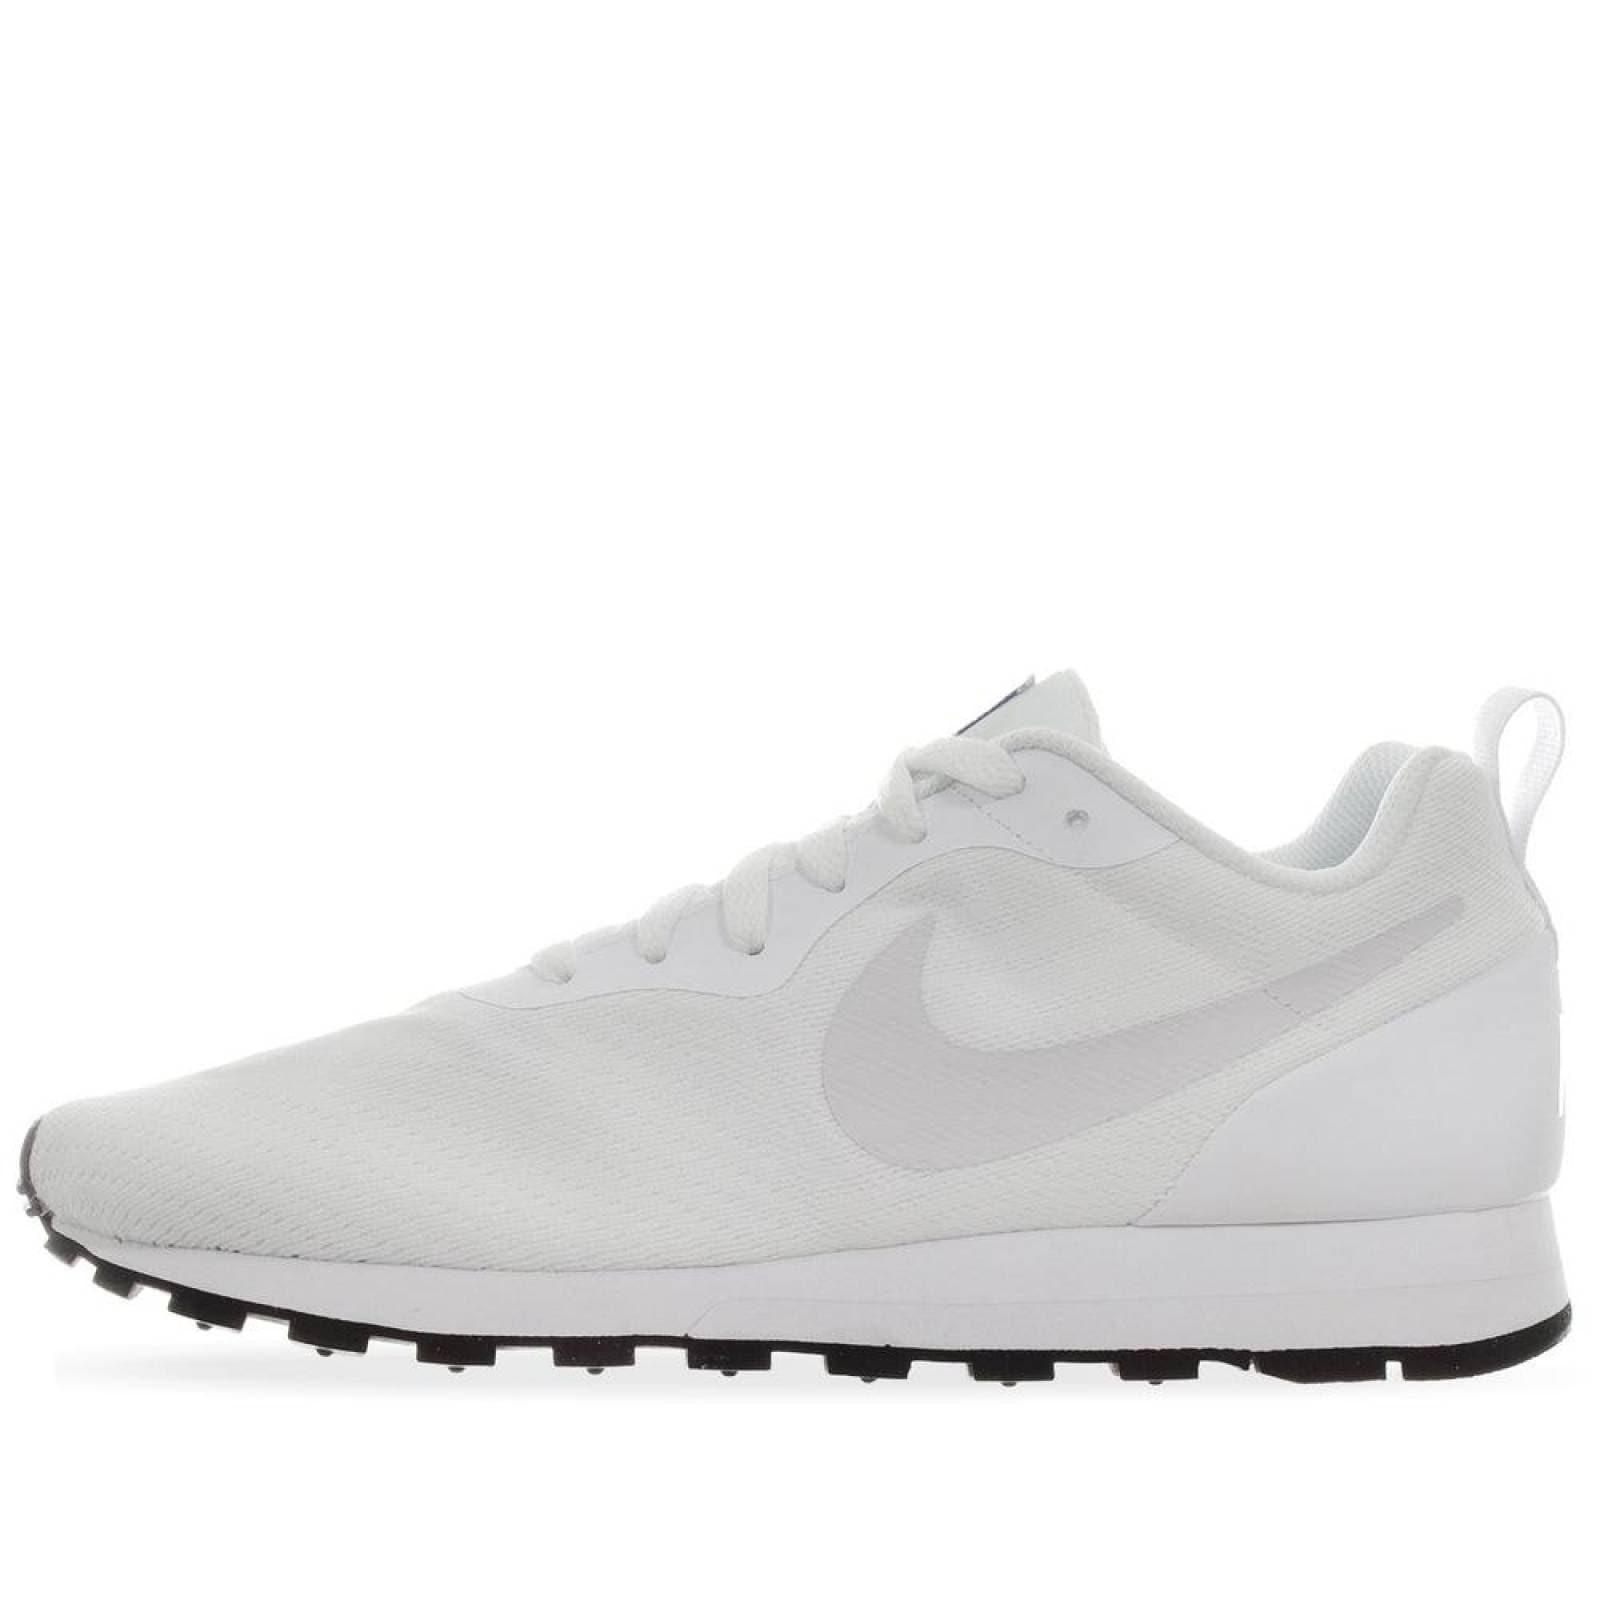 Tenis Nike MD Runner 2 ENG Mesh 916774101 Blanco Hombre